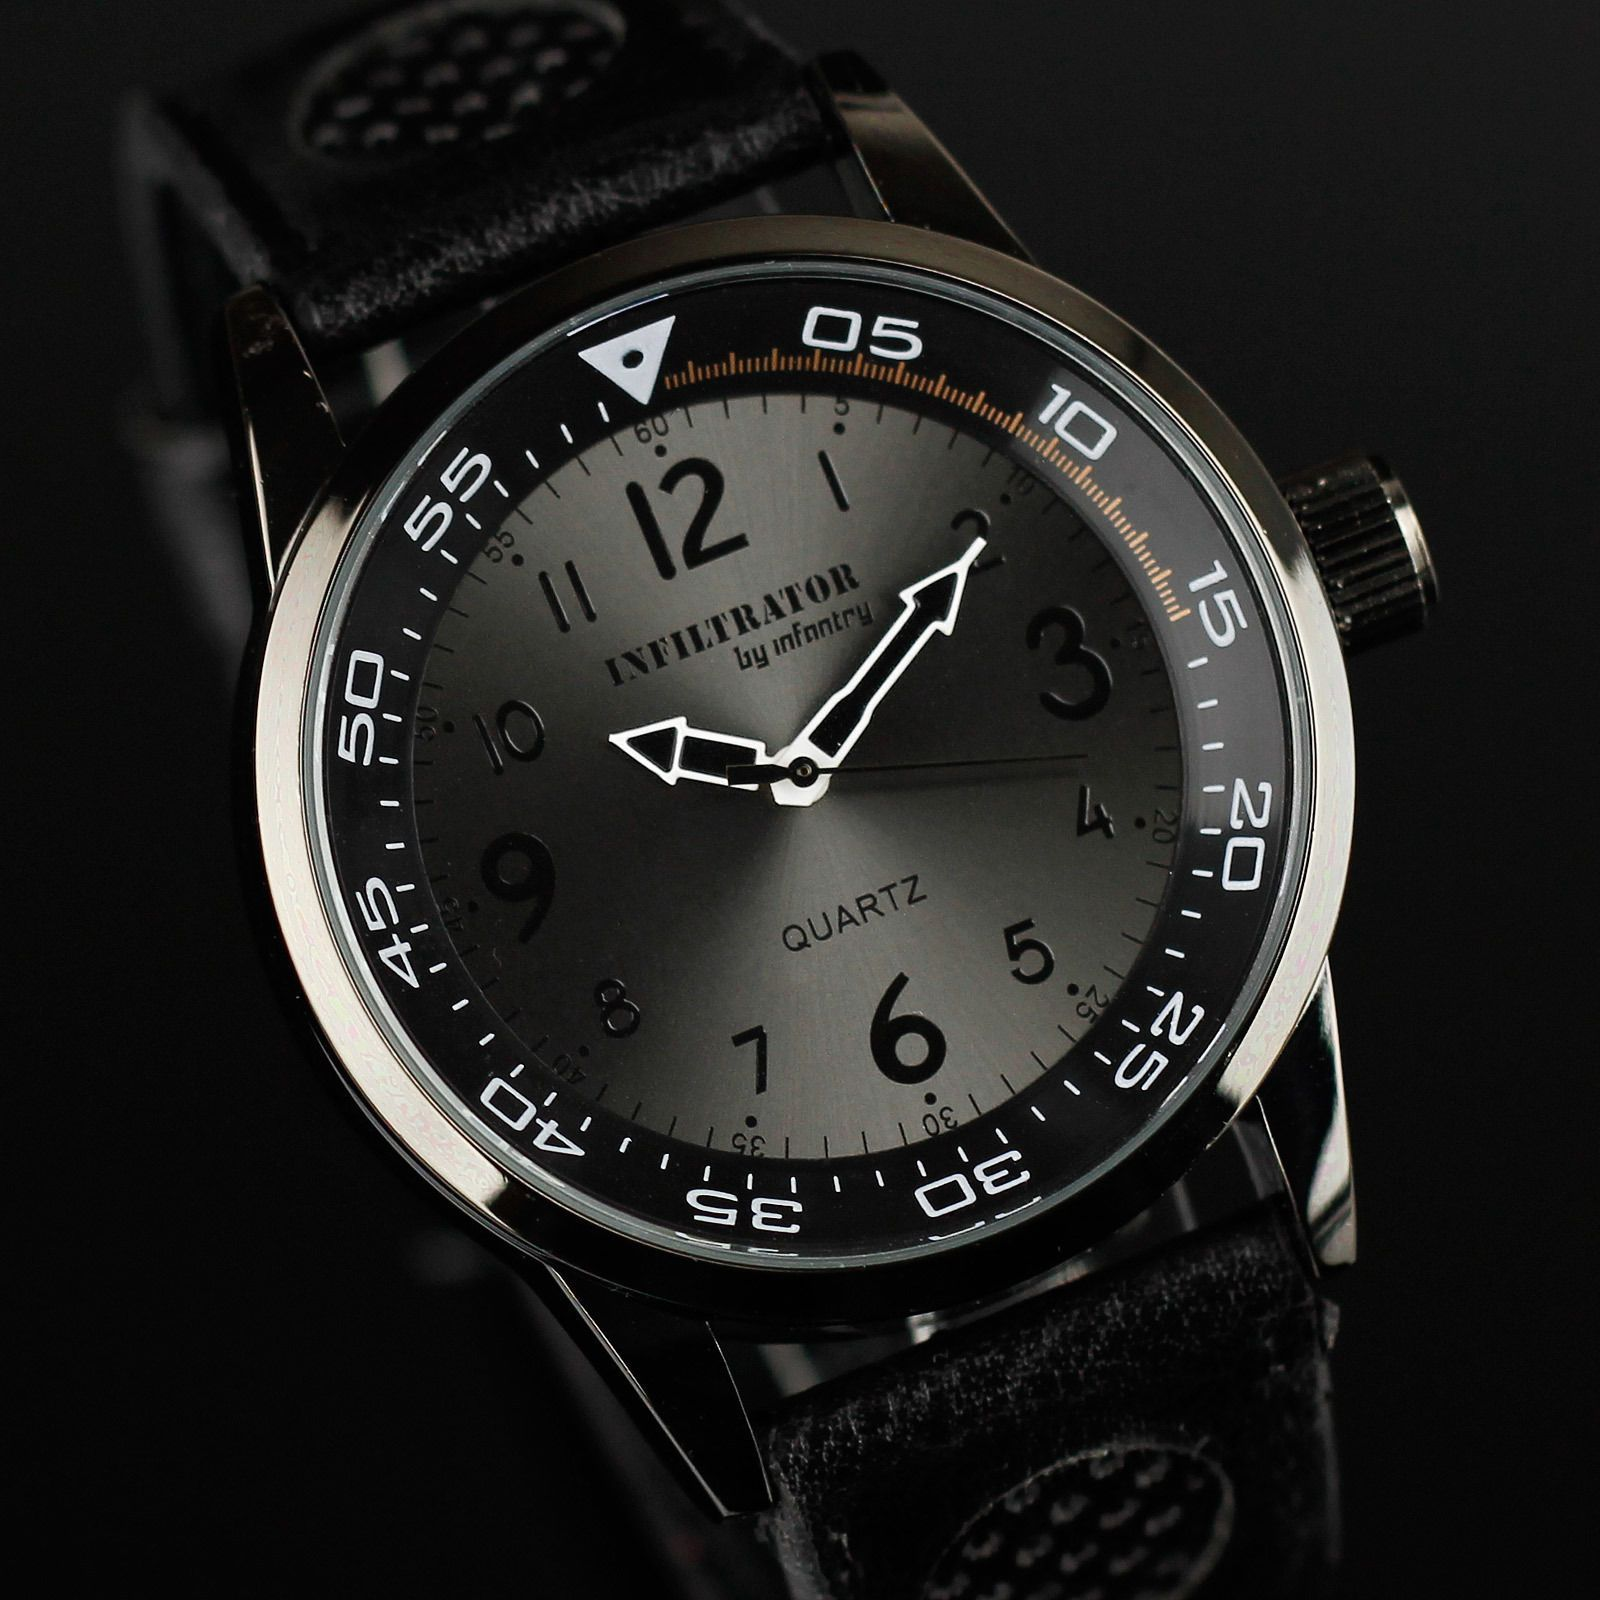 Infantry infiltrator mens analog quartz wrist watch army